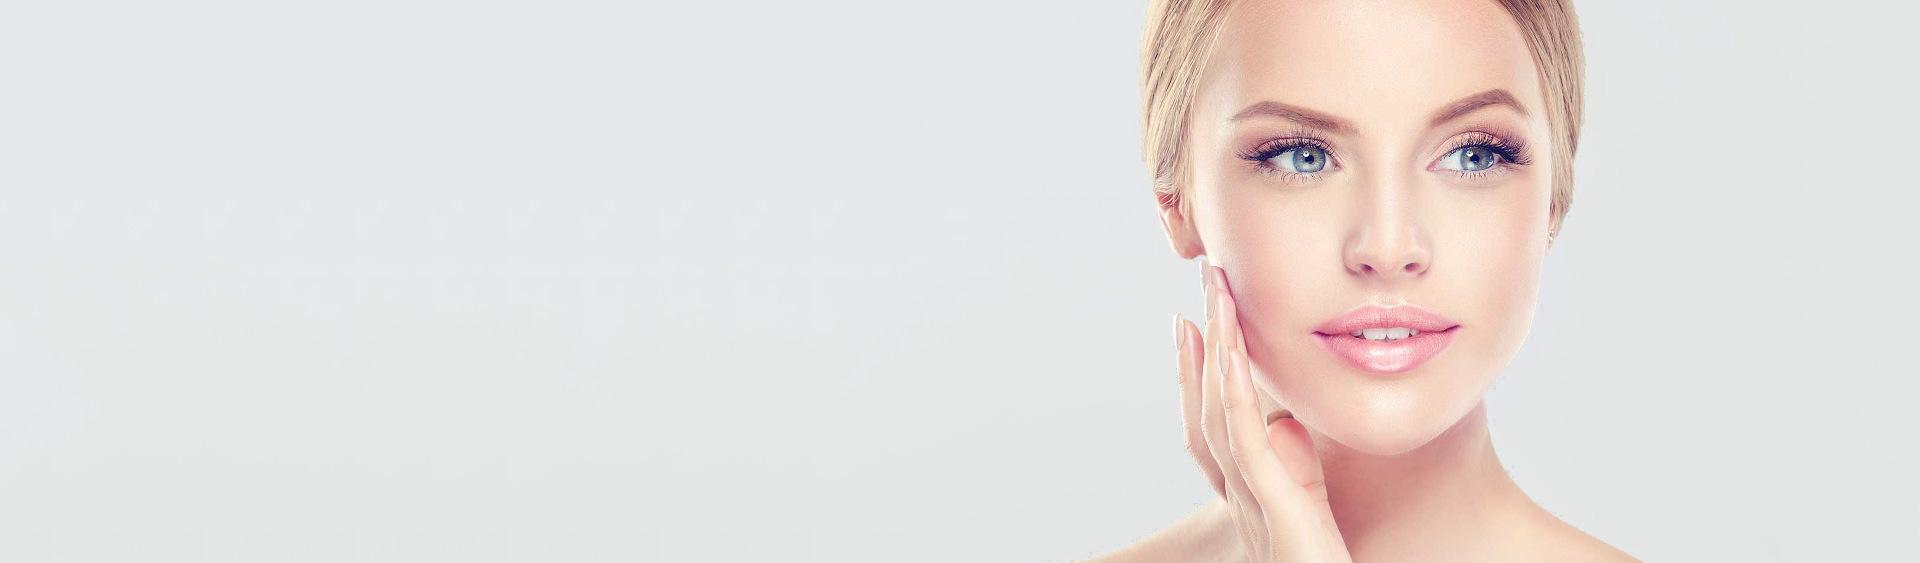 cosmesi-bellezza-farmacia